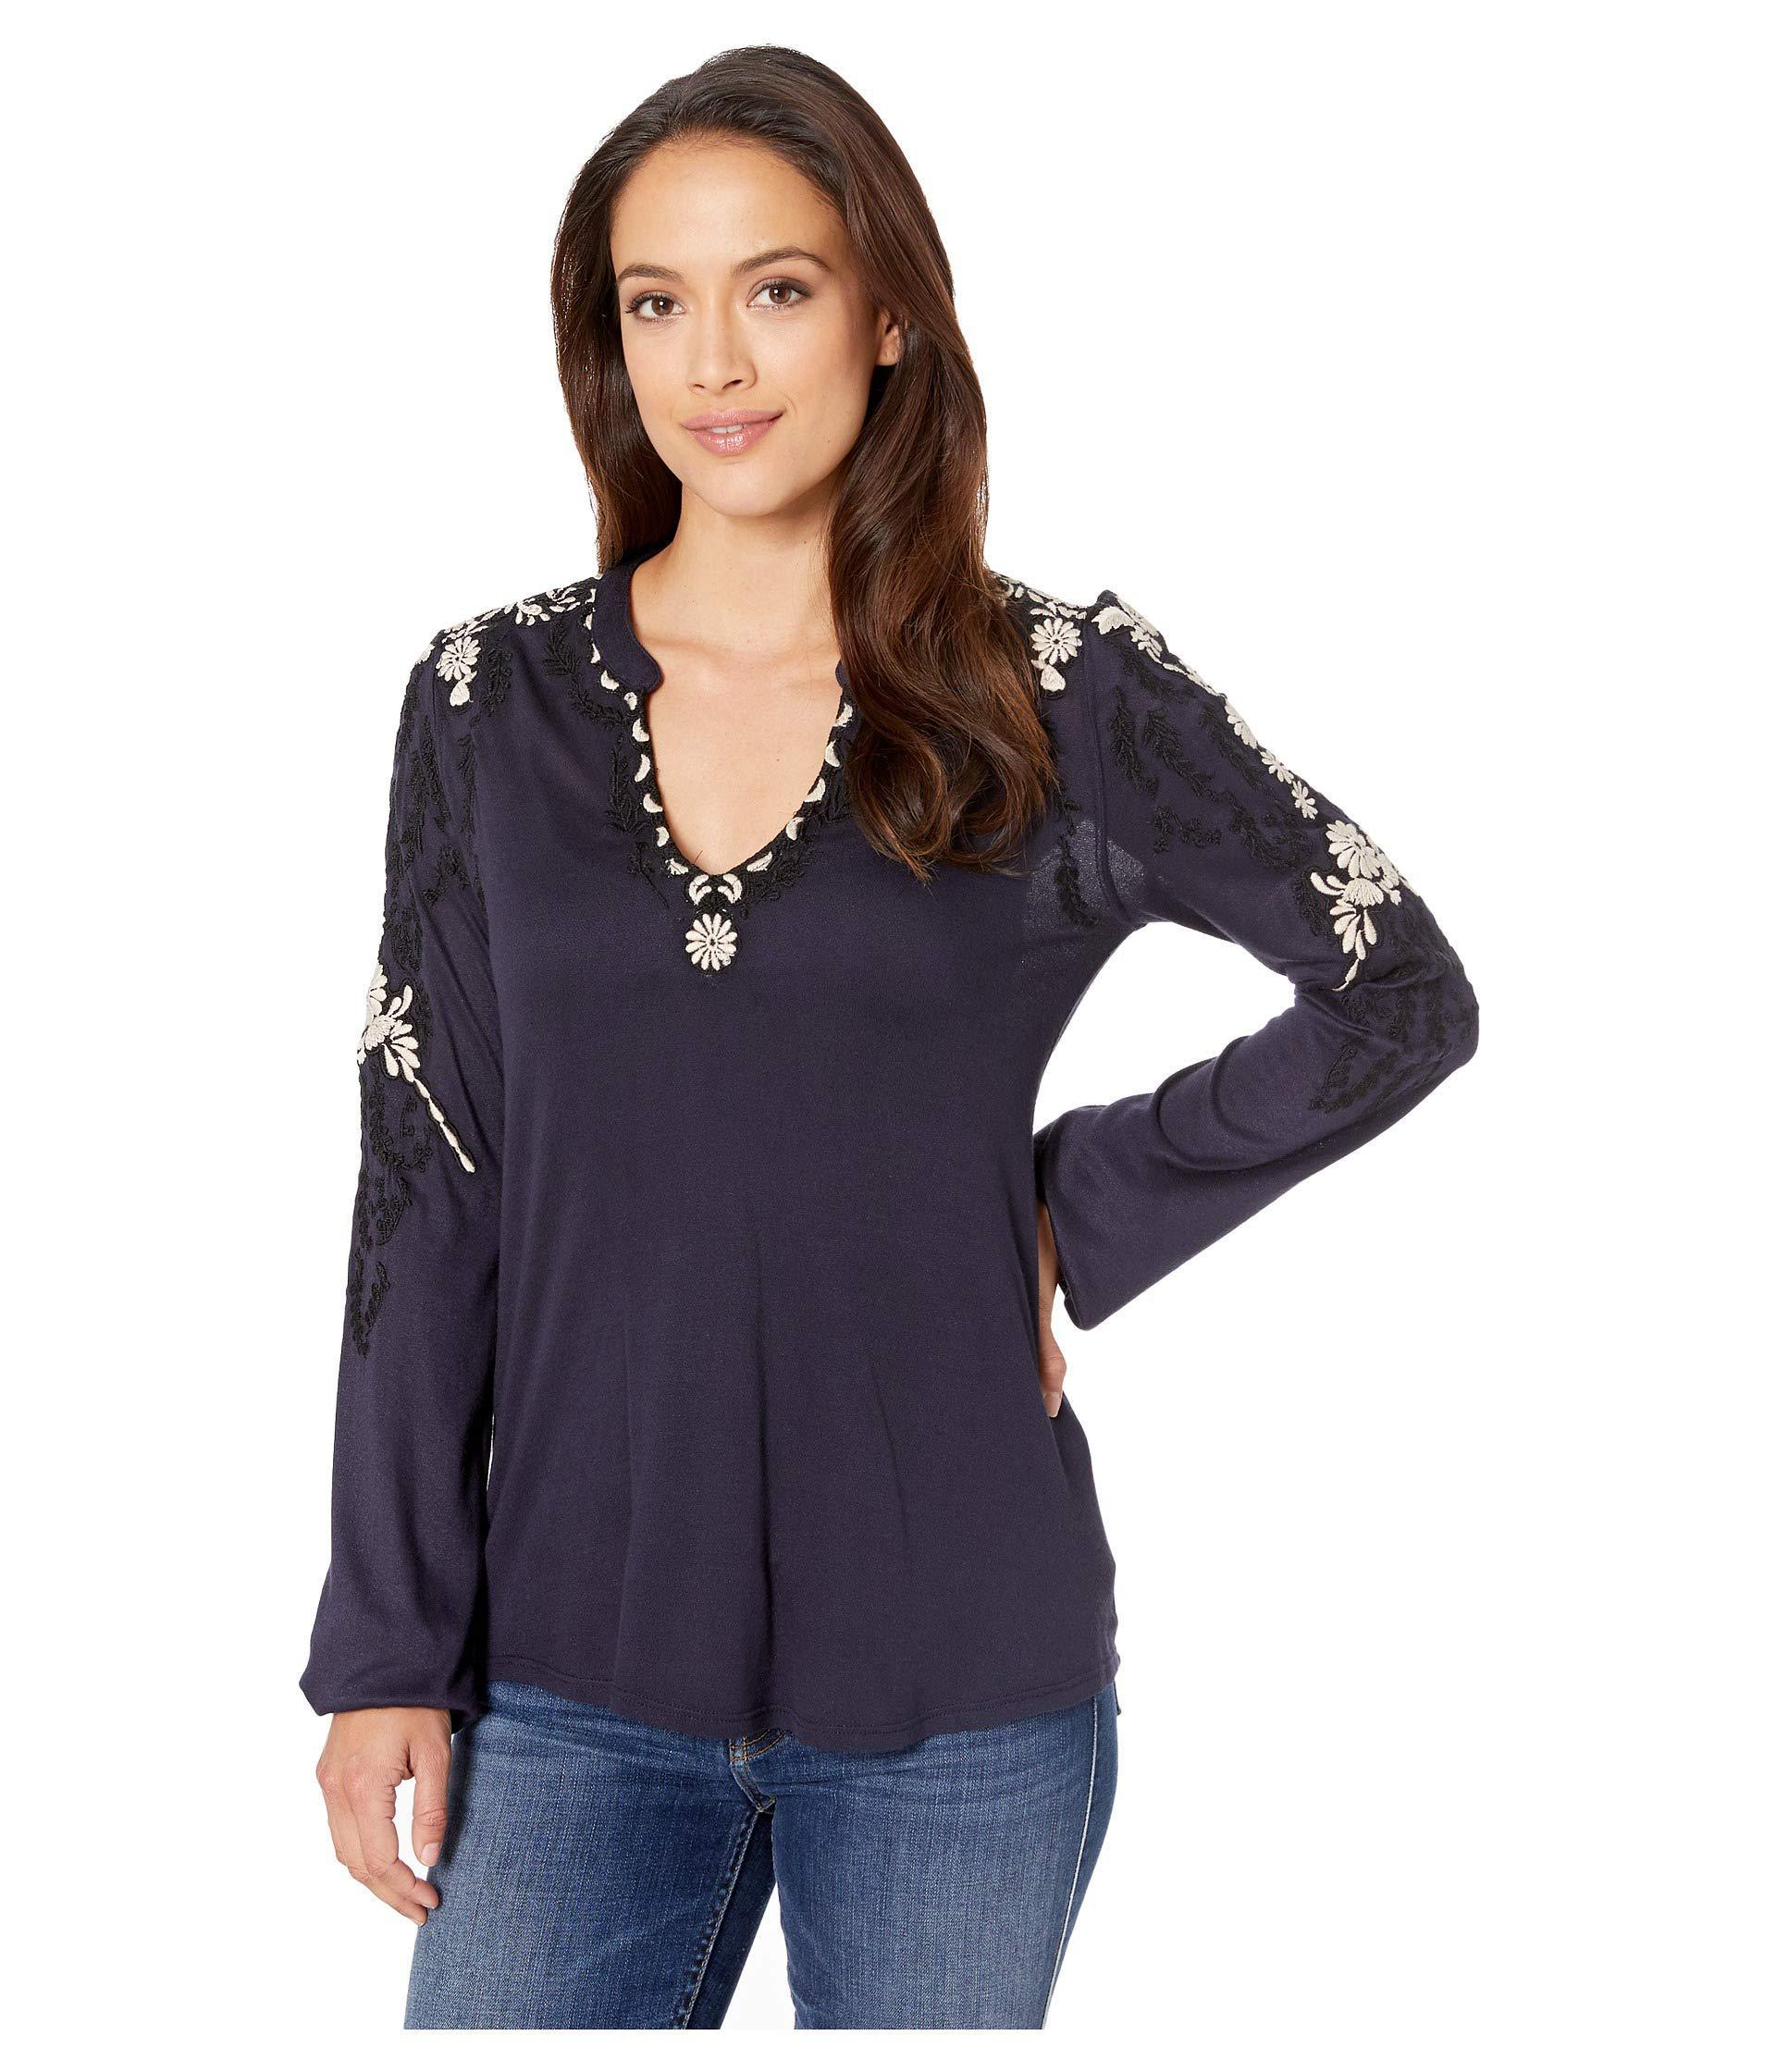 02d76d6850495 Lyst - Lucky Brand Embroidered Sleeve Top (cabernet) Women s ...